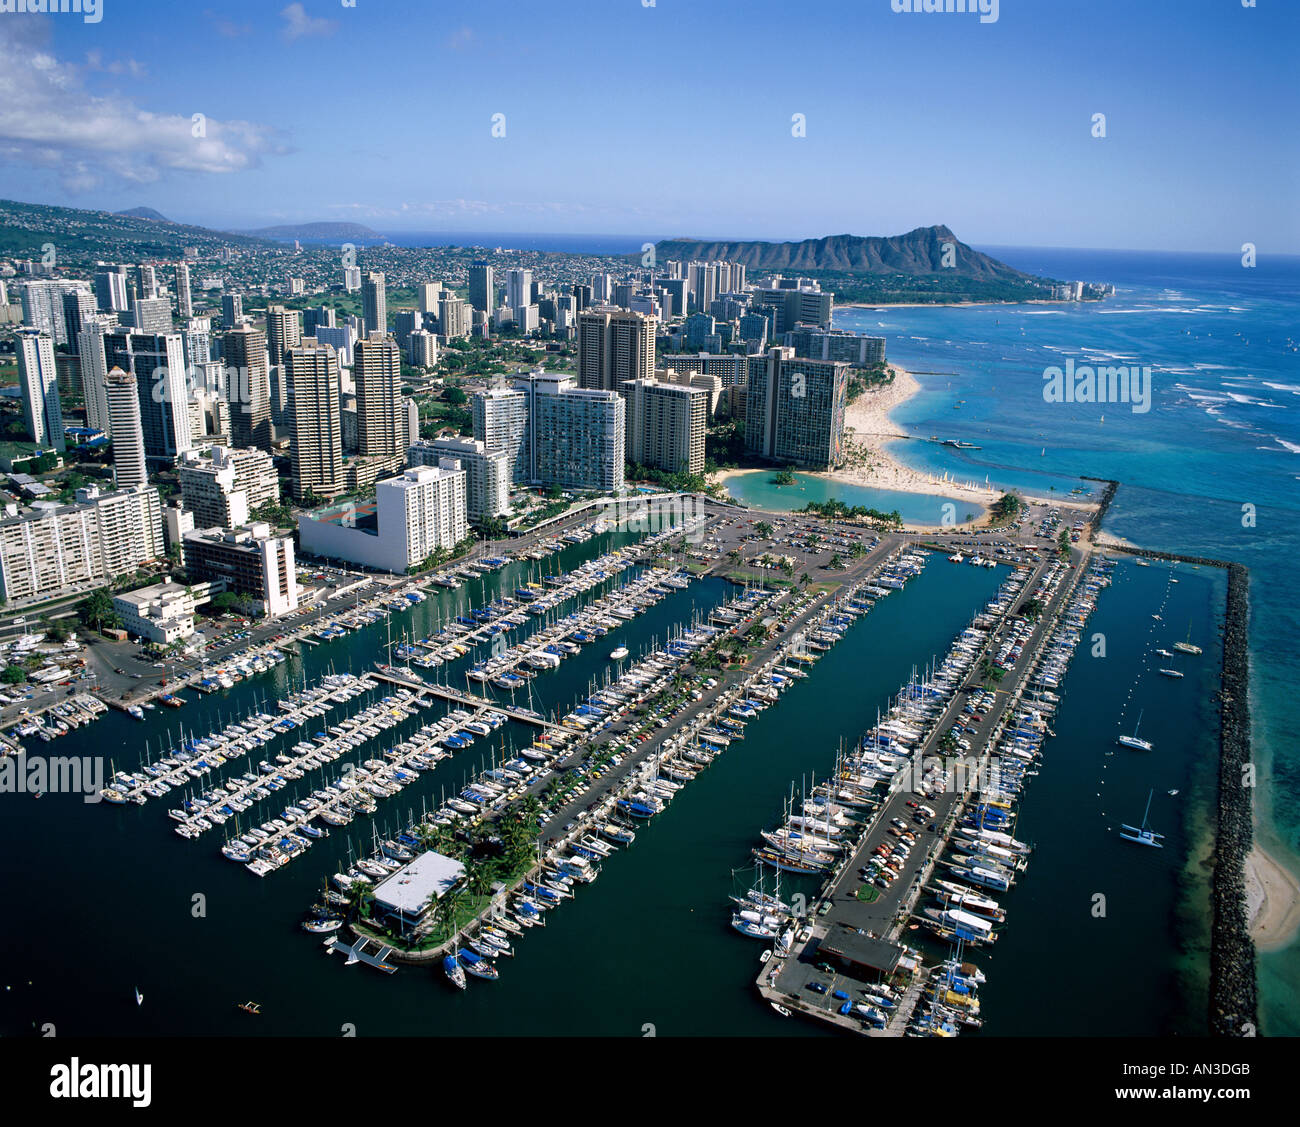 Harbor Island Marina Ocean City